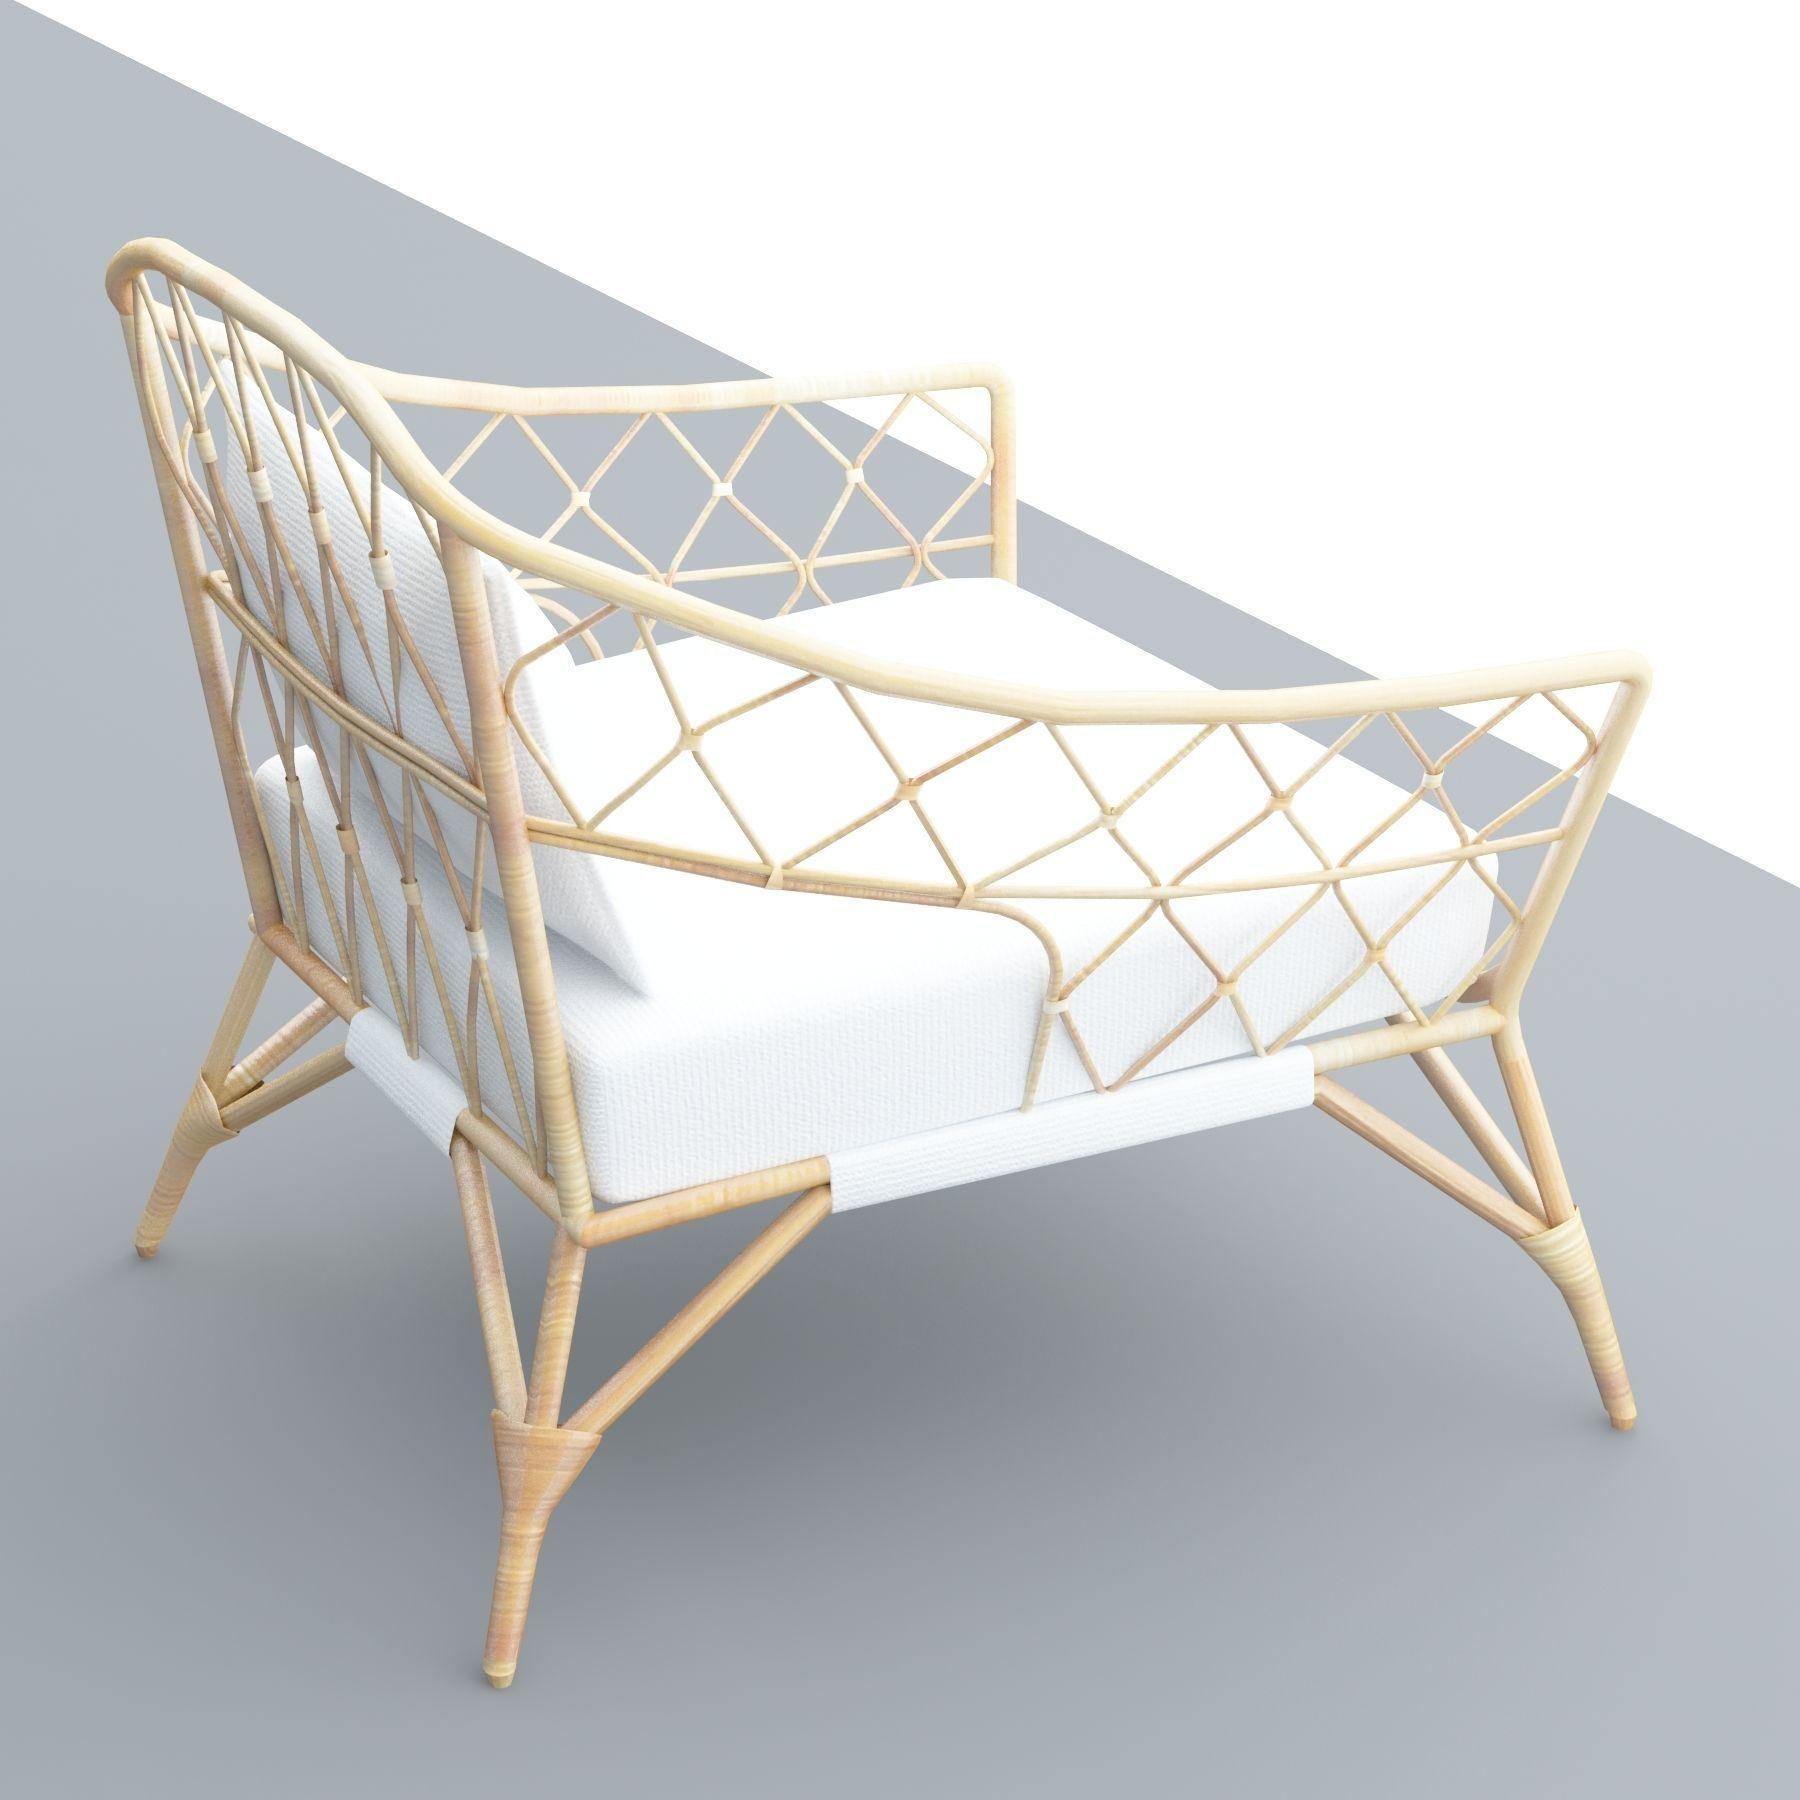 ... stockholm ikea rattan chair 3d model low-poly max obj mtl 3ds fbx dae skp ...  sc 1 st  CGTrader & StockHolm IKEA Rattan Chair 3D asset VR / AR ready